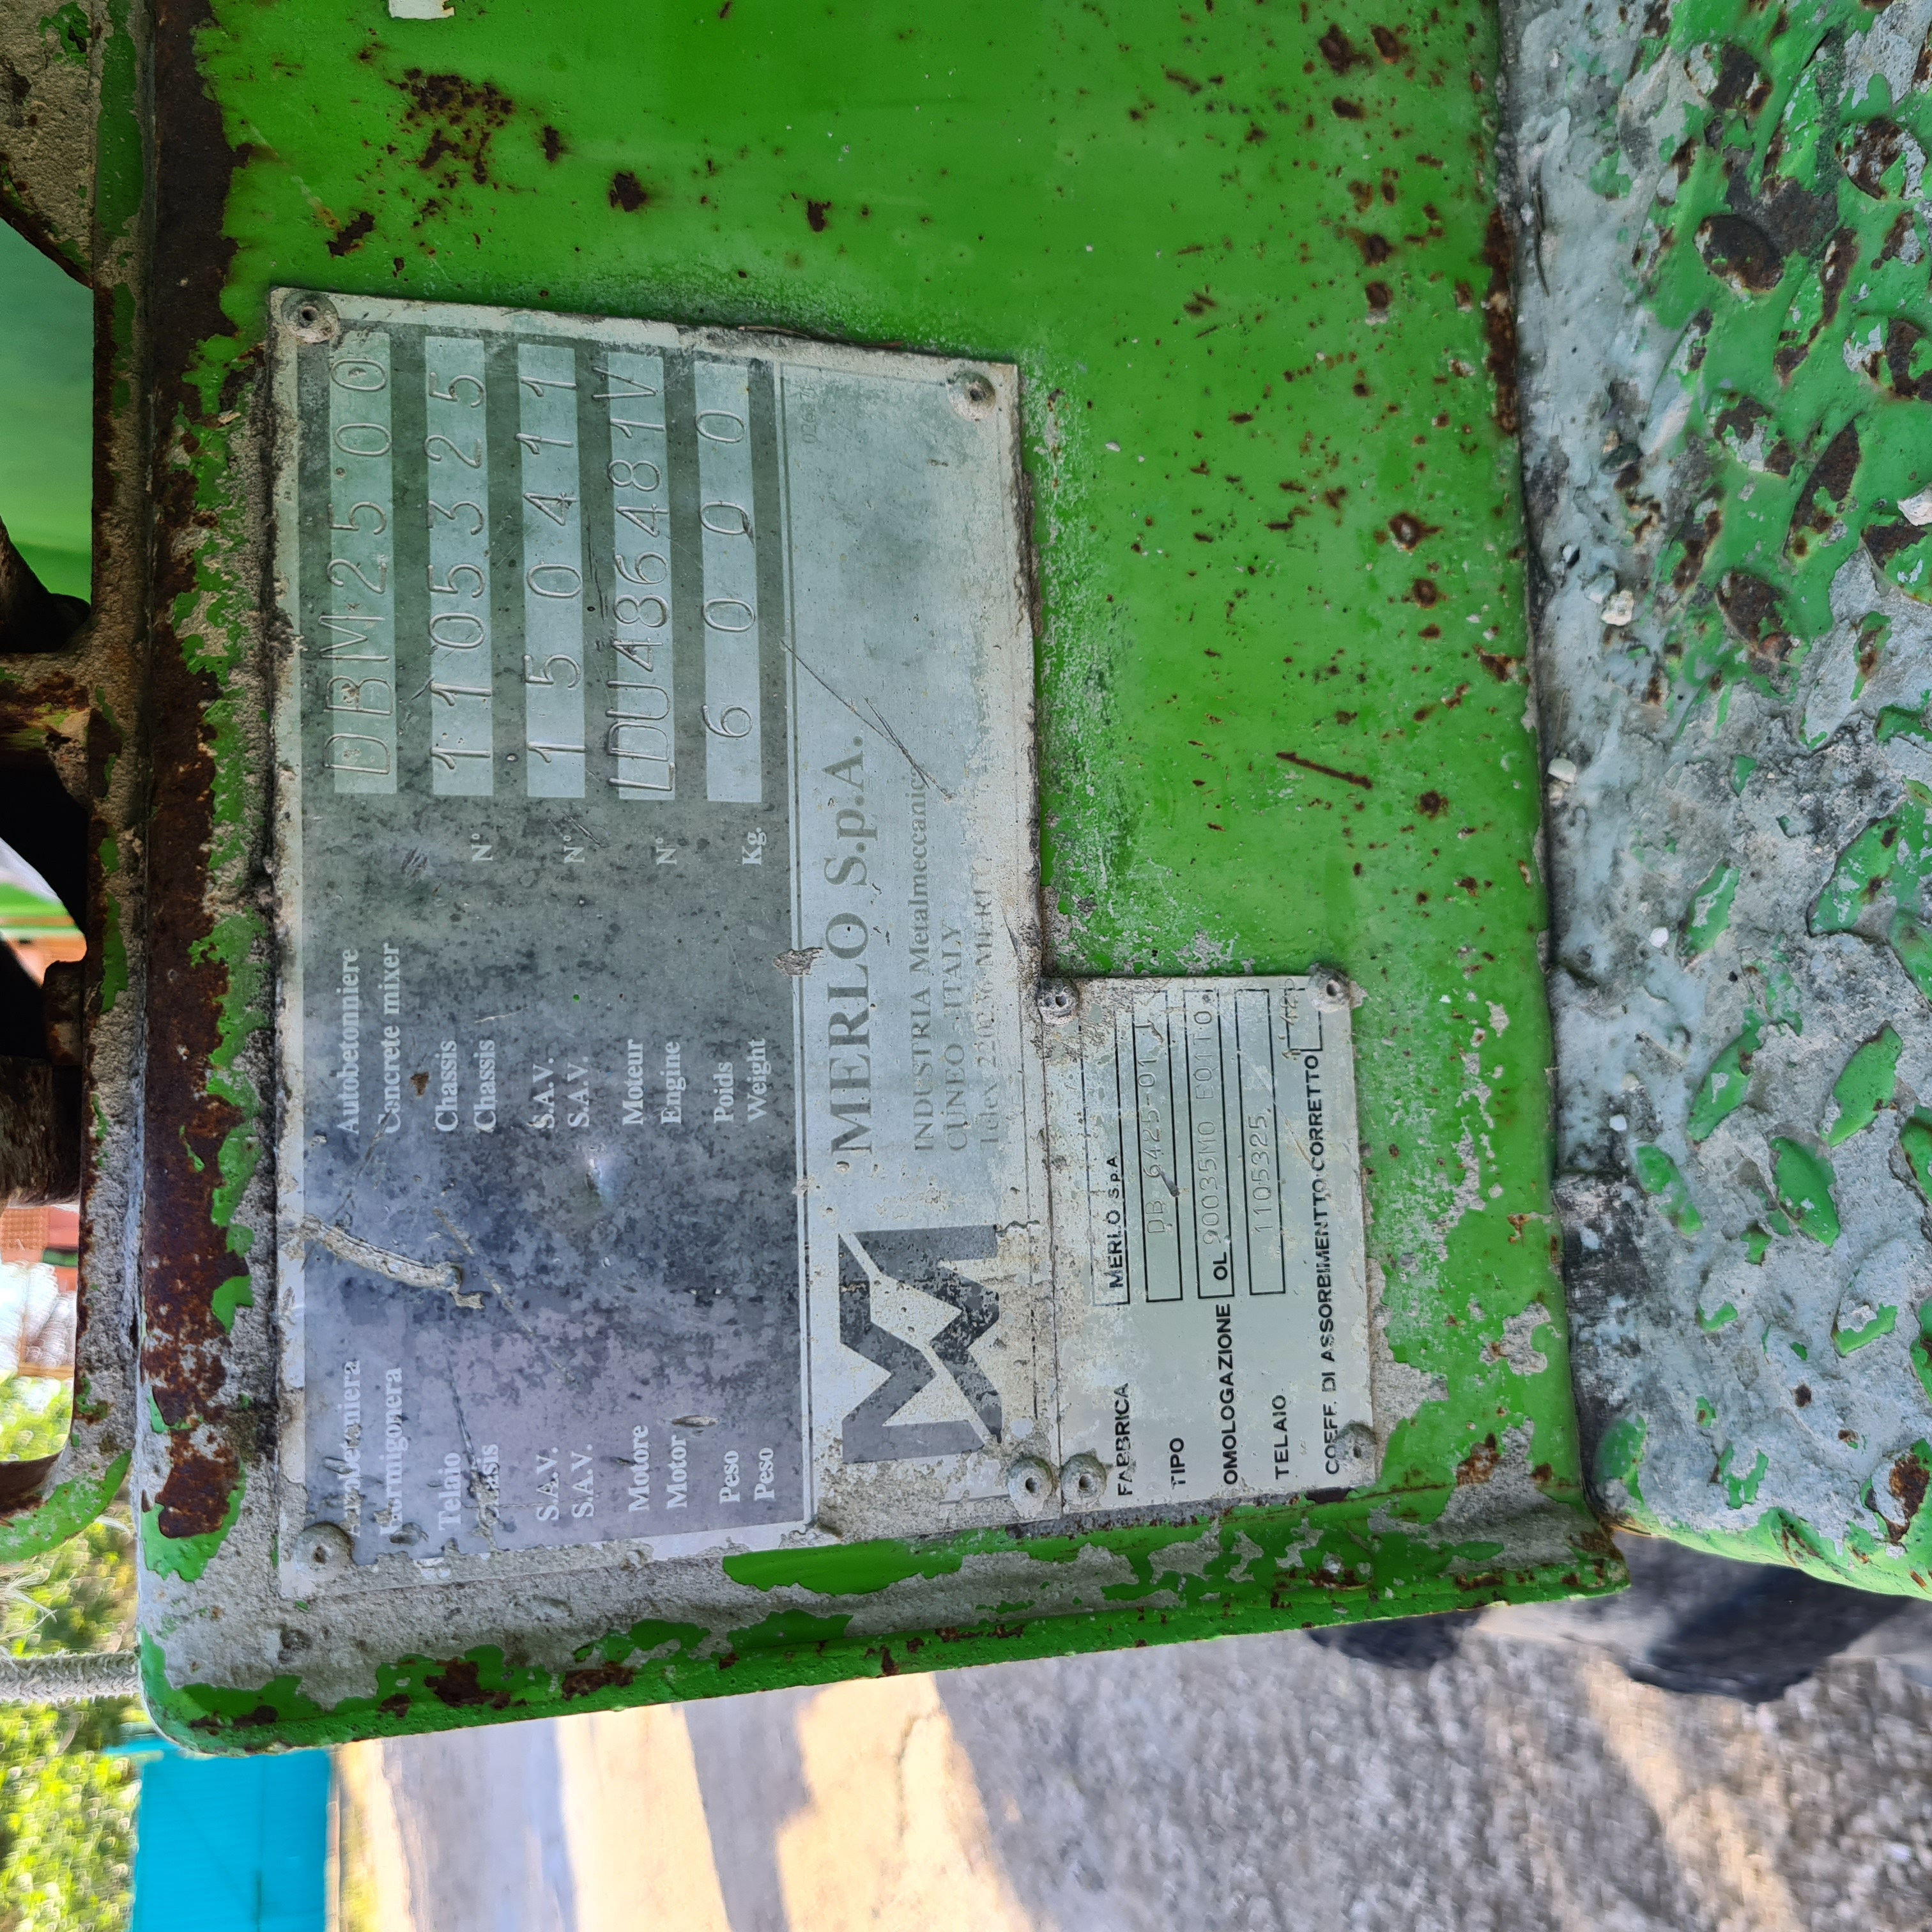 Merlo dumper betoniera dbm 2500 in vendita - foto 9